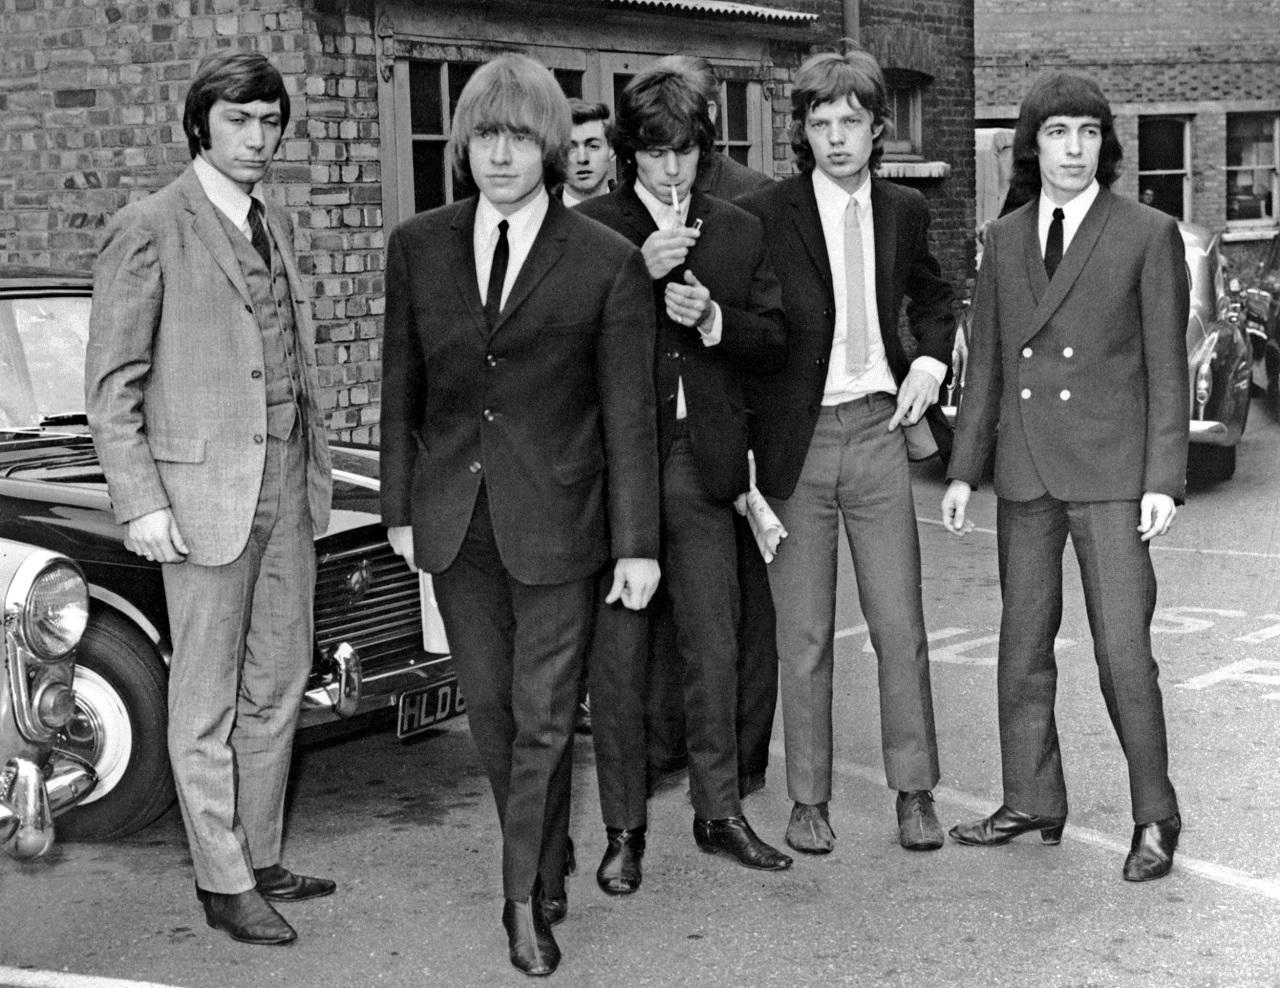 Rolling Stones 1965 in schwarzweiß